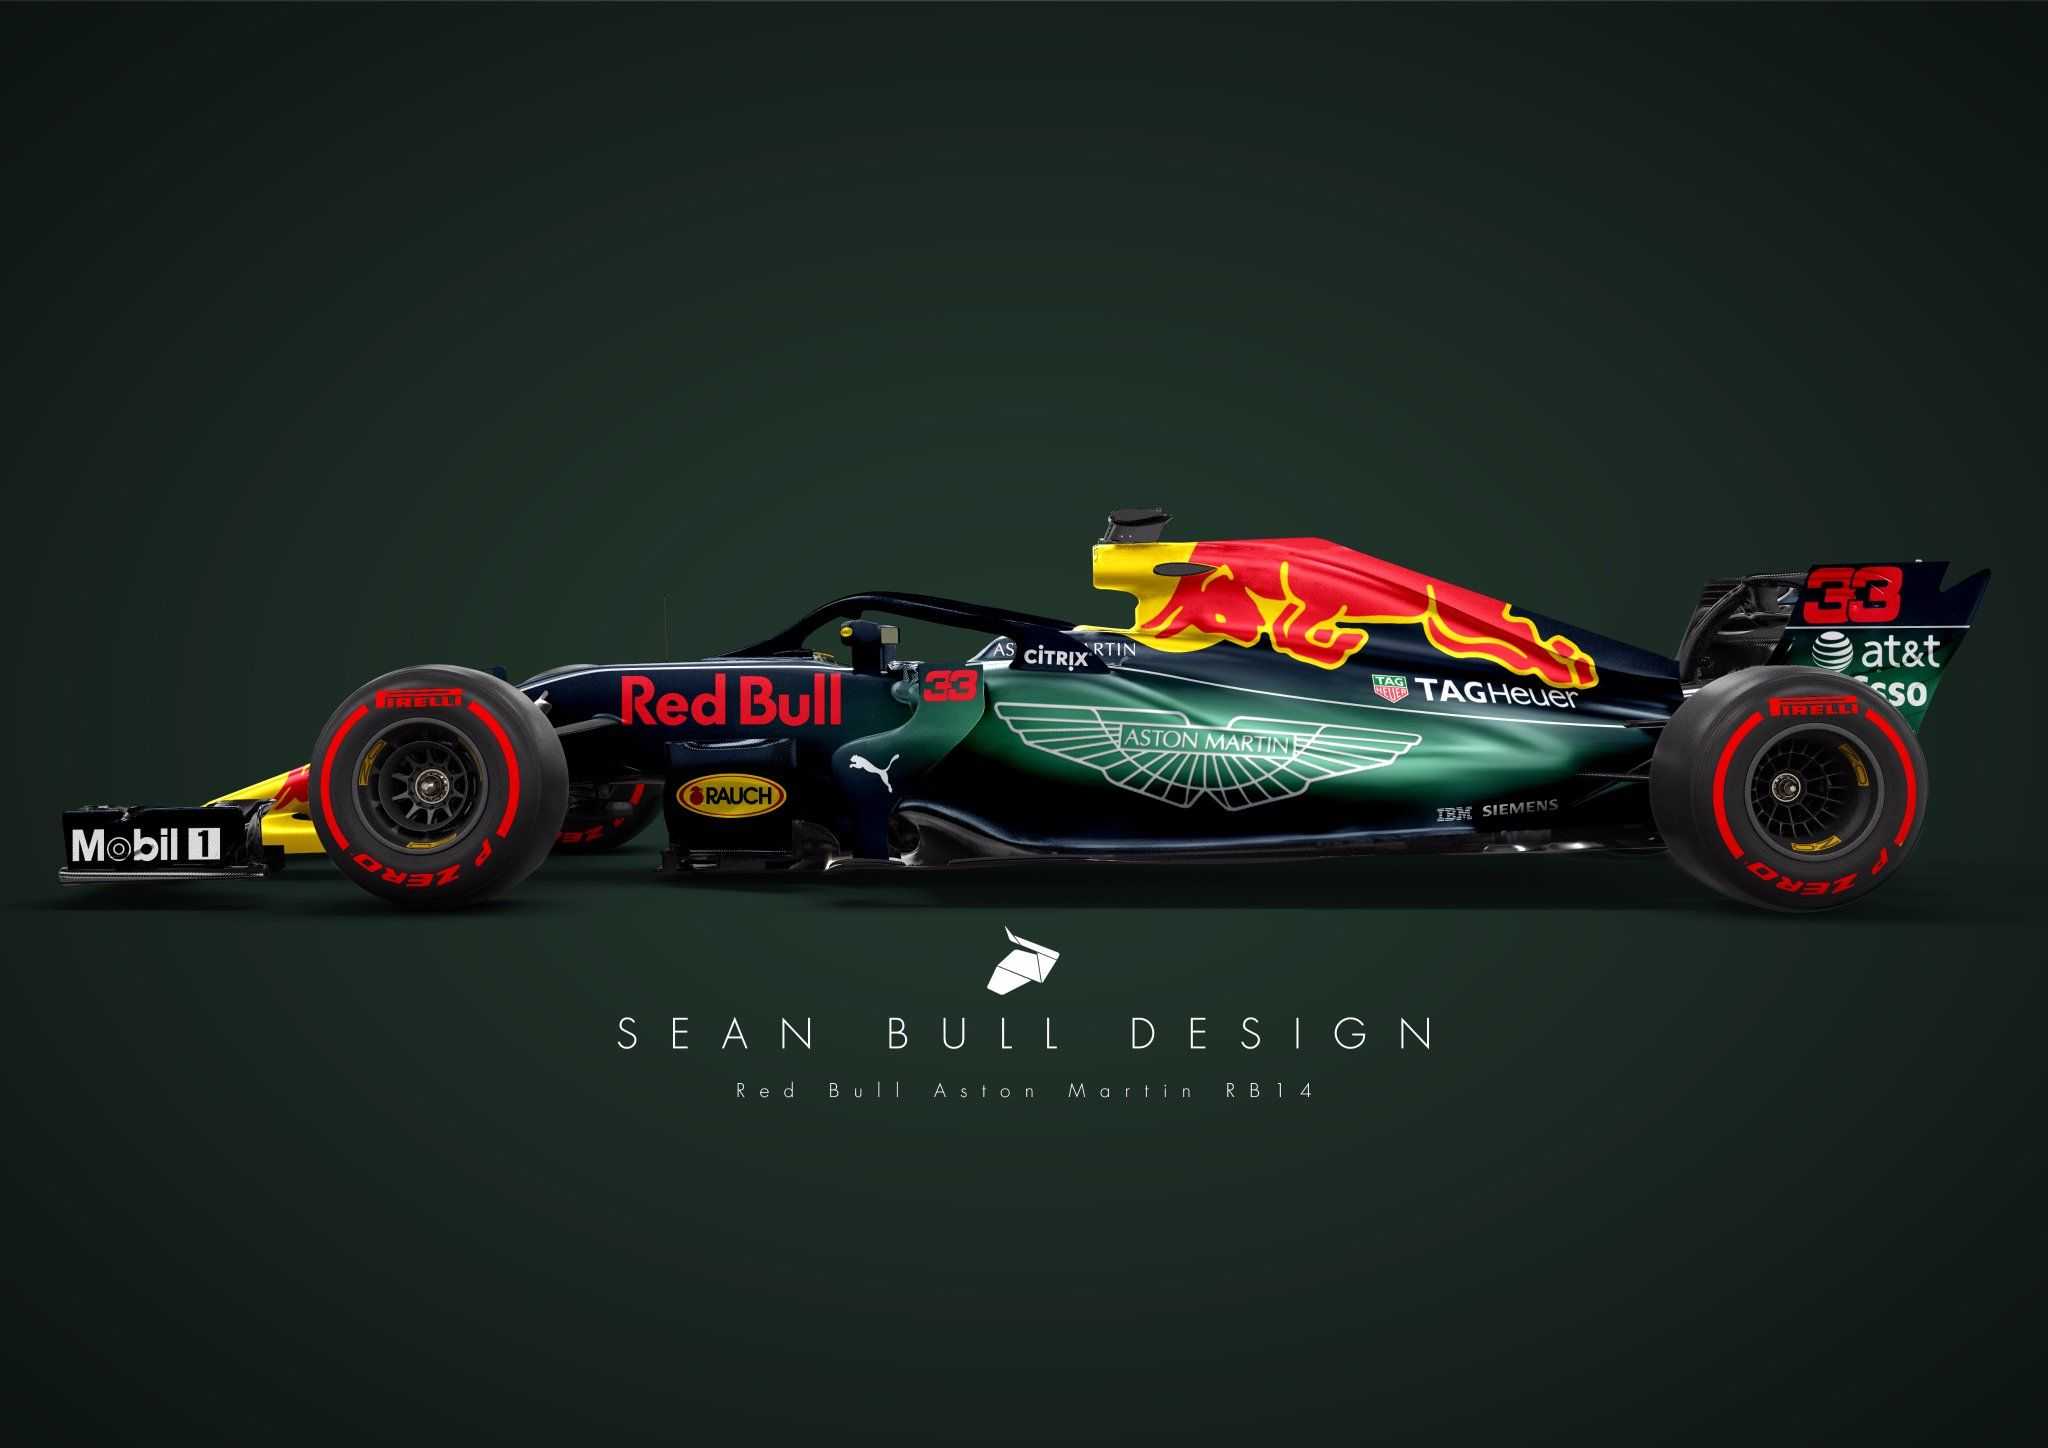 Sean Bull Design Seanbulldesign Twitter Red Bull Racing Racing Race Cars